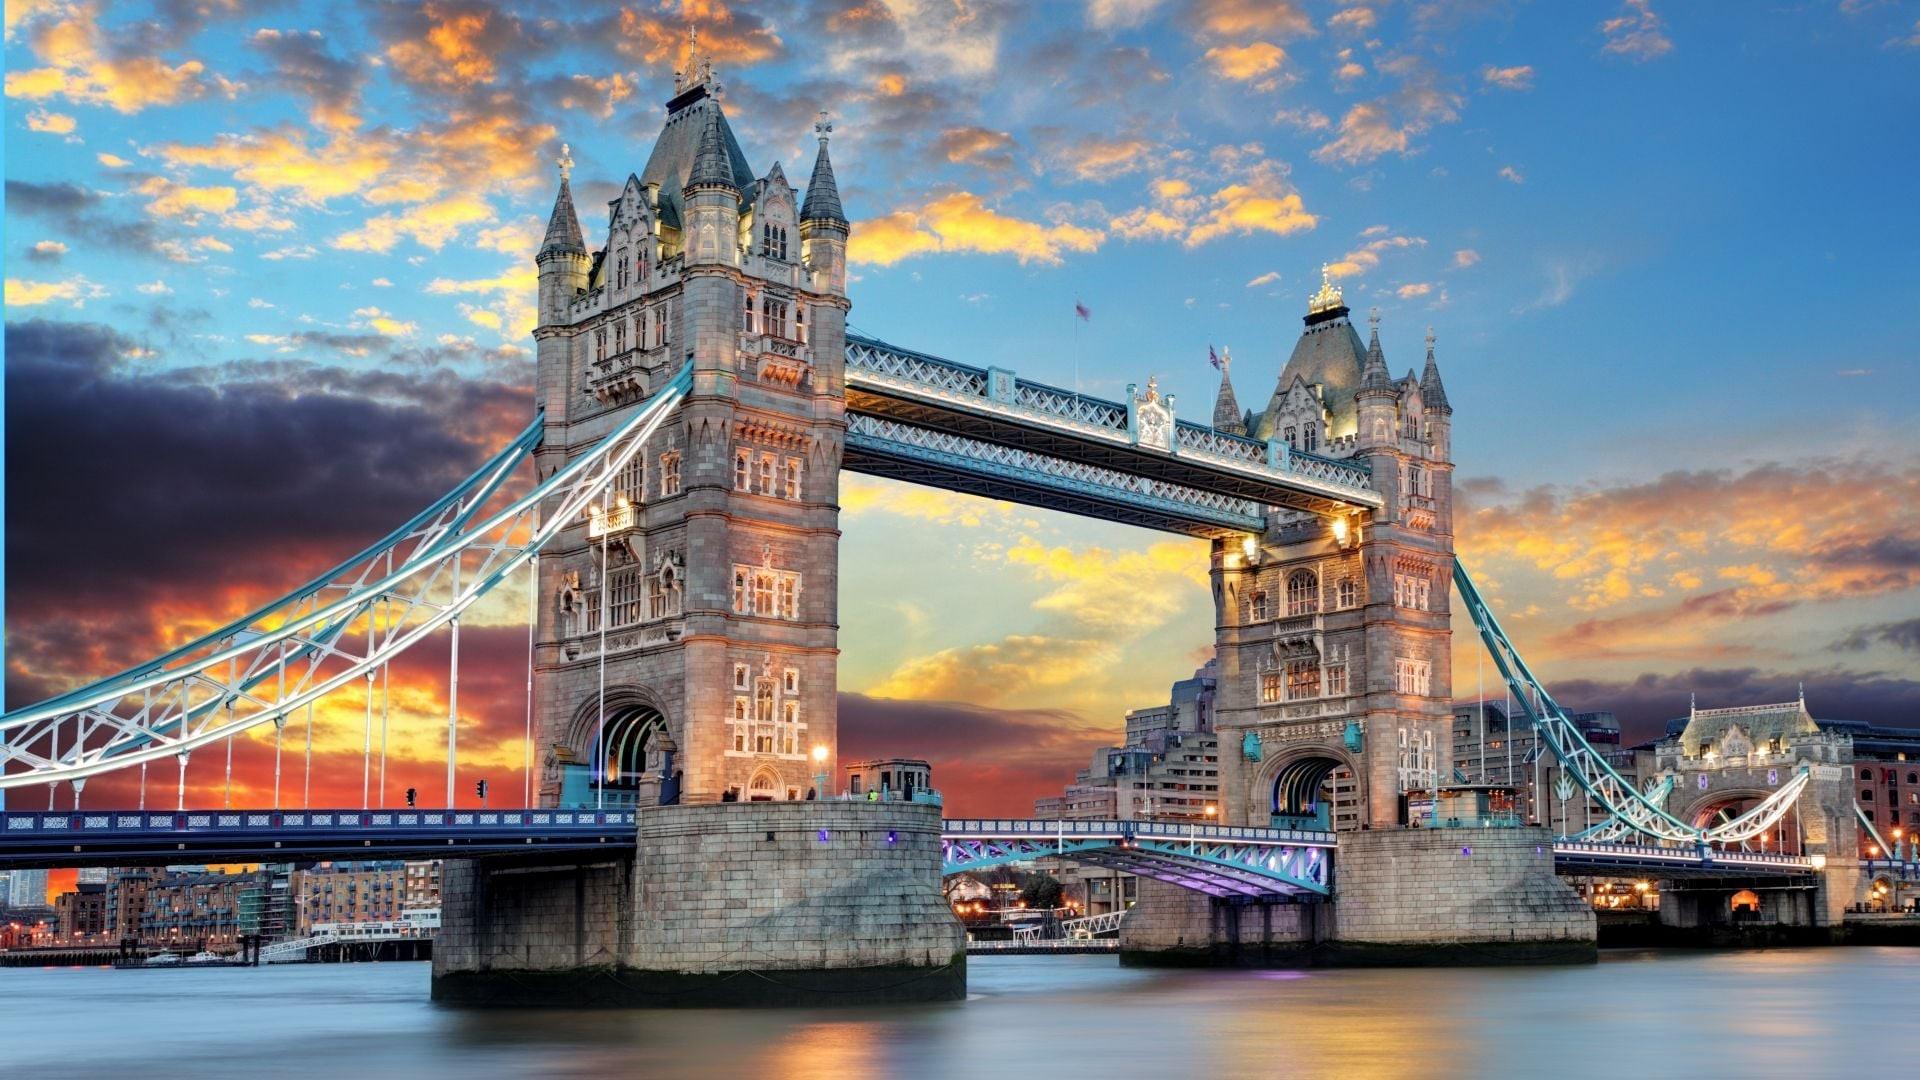 Res: 1920x1080, London Tower Bridge